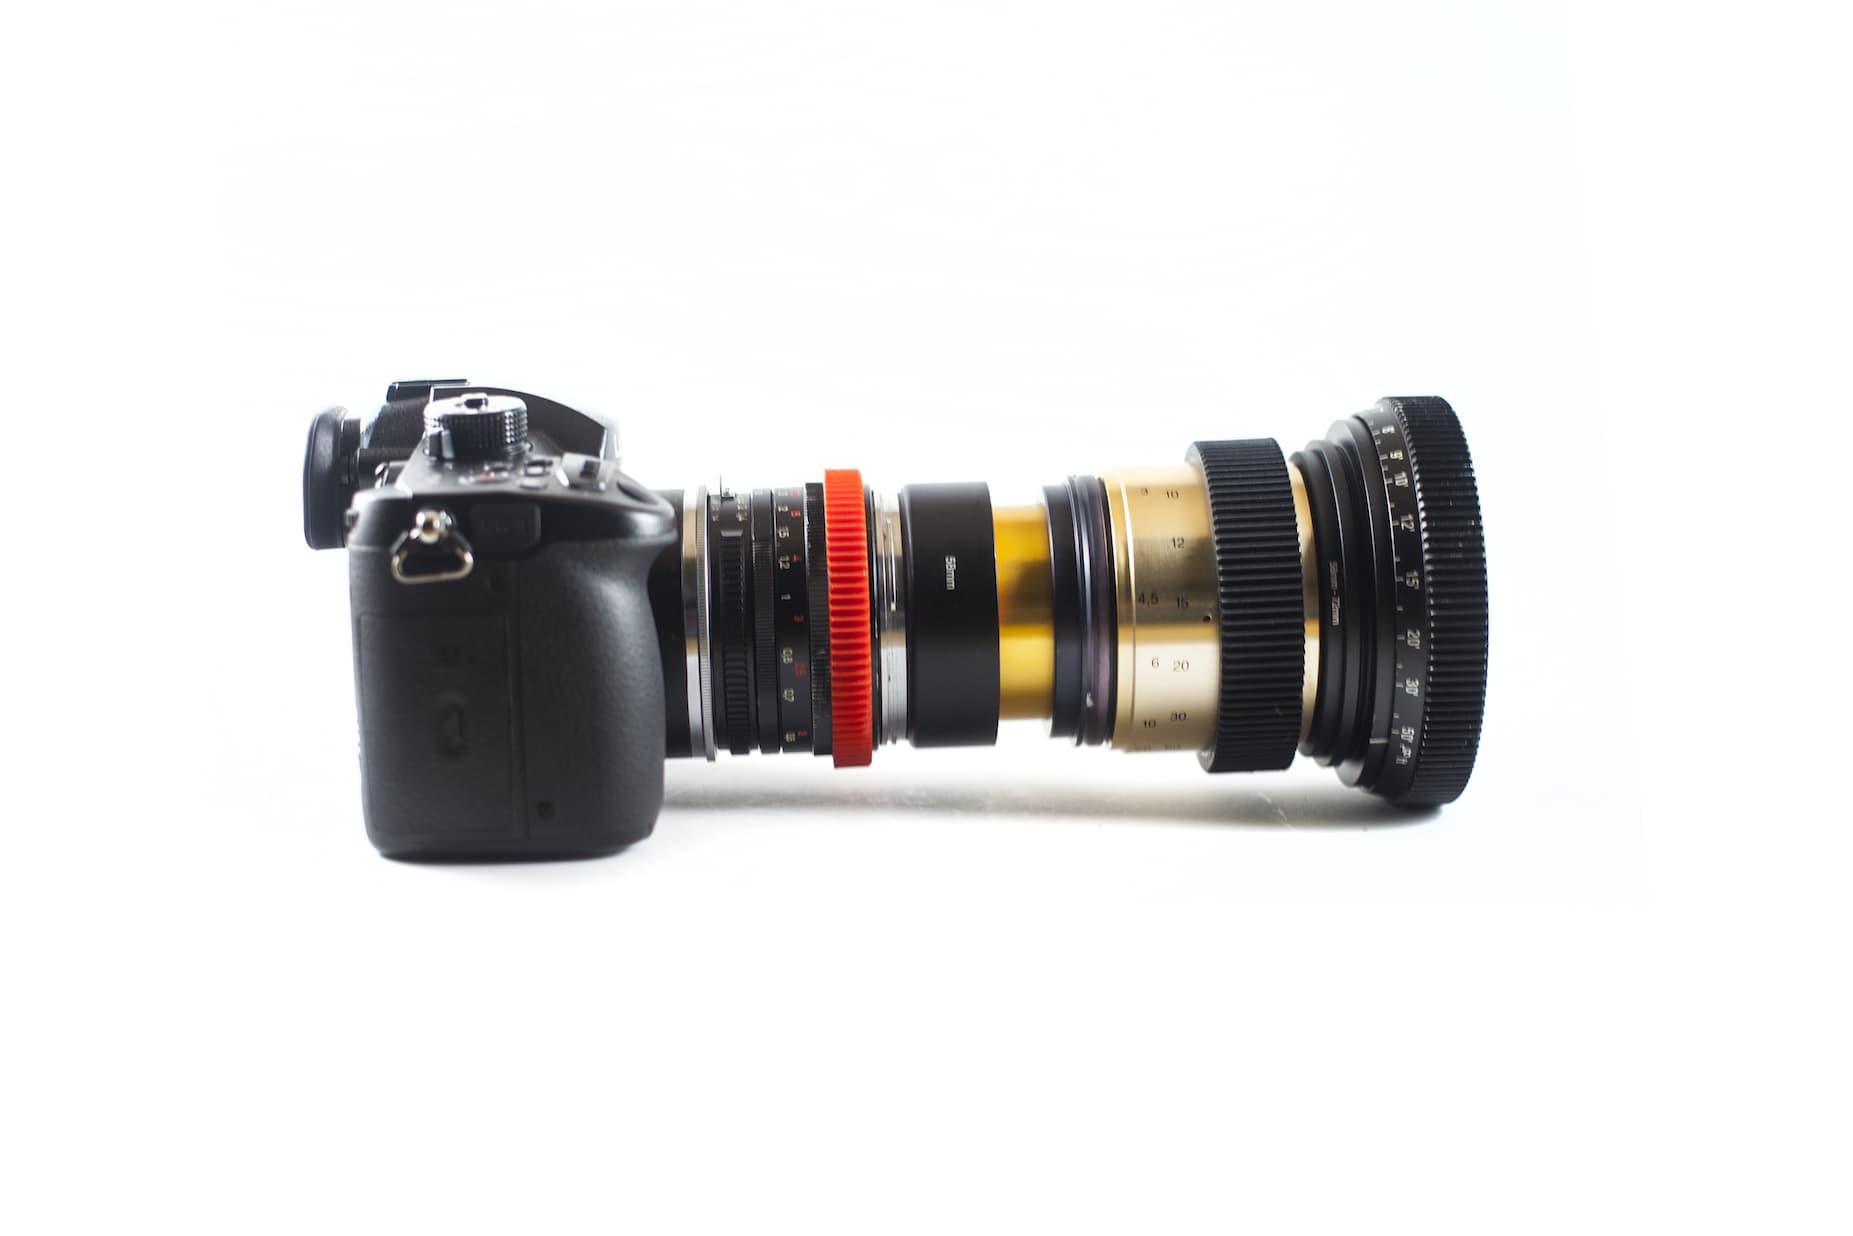 Panasonic GH5 Anamorphic Lens Impressions